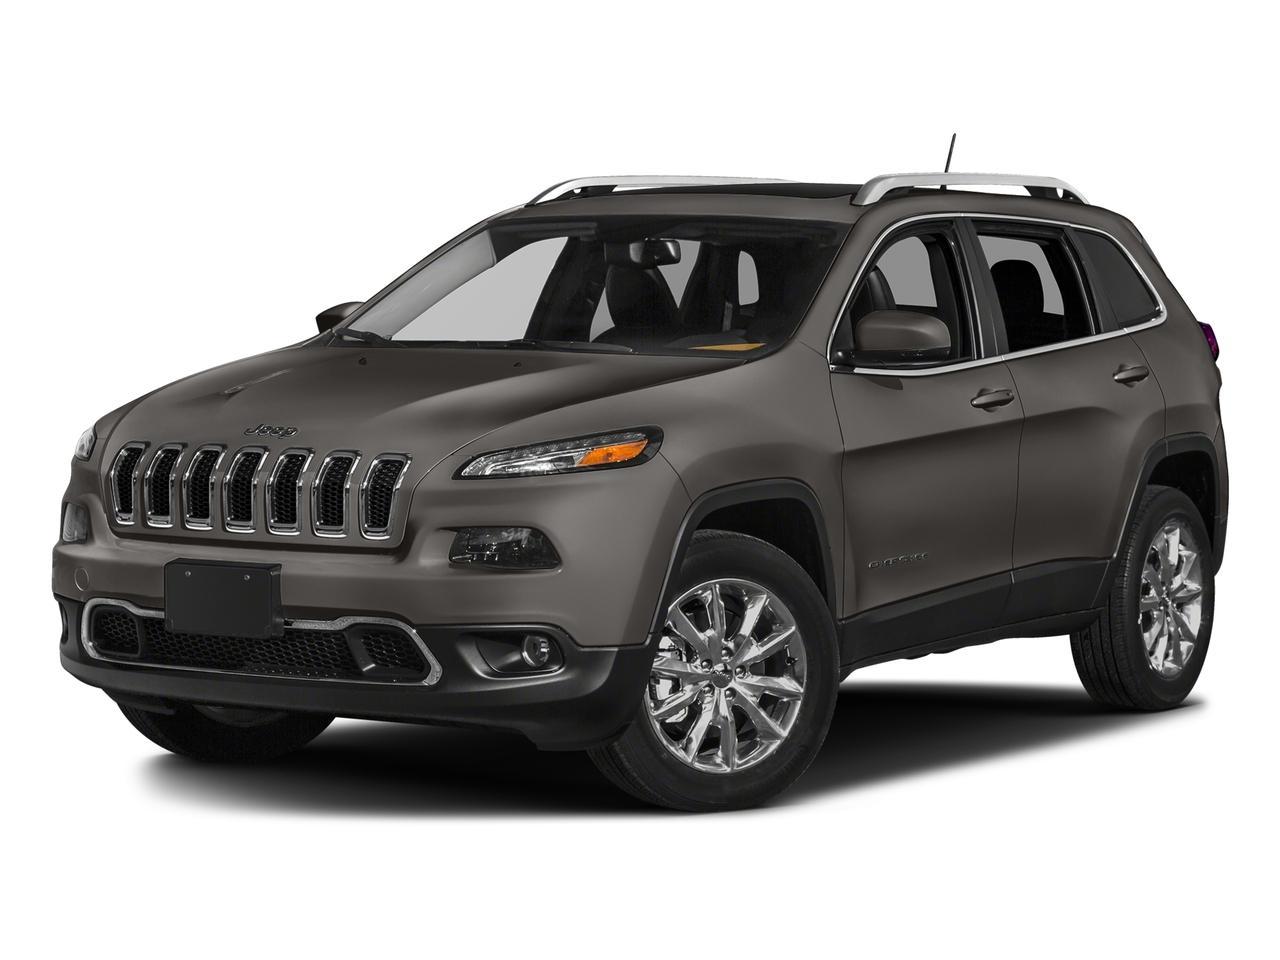 2018 Jeep Cherokee Vehicle Photo in Moon Township, PA 15108